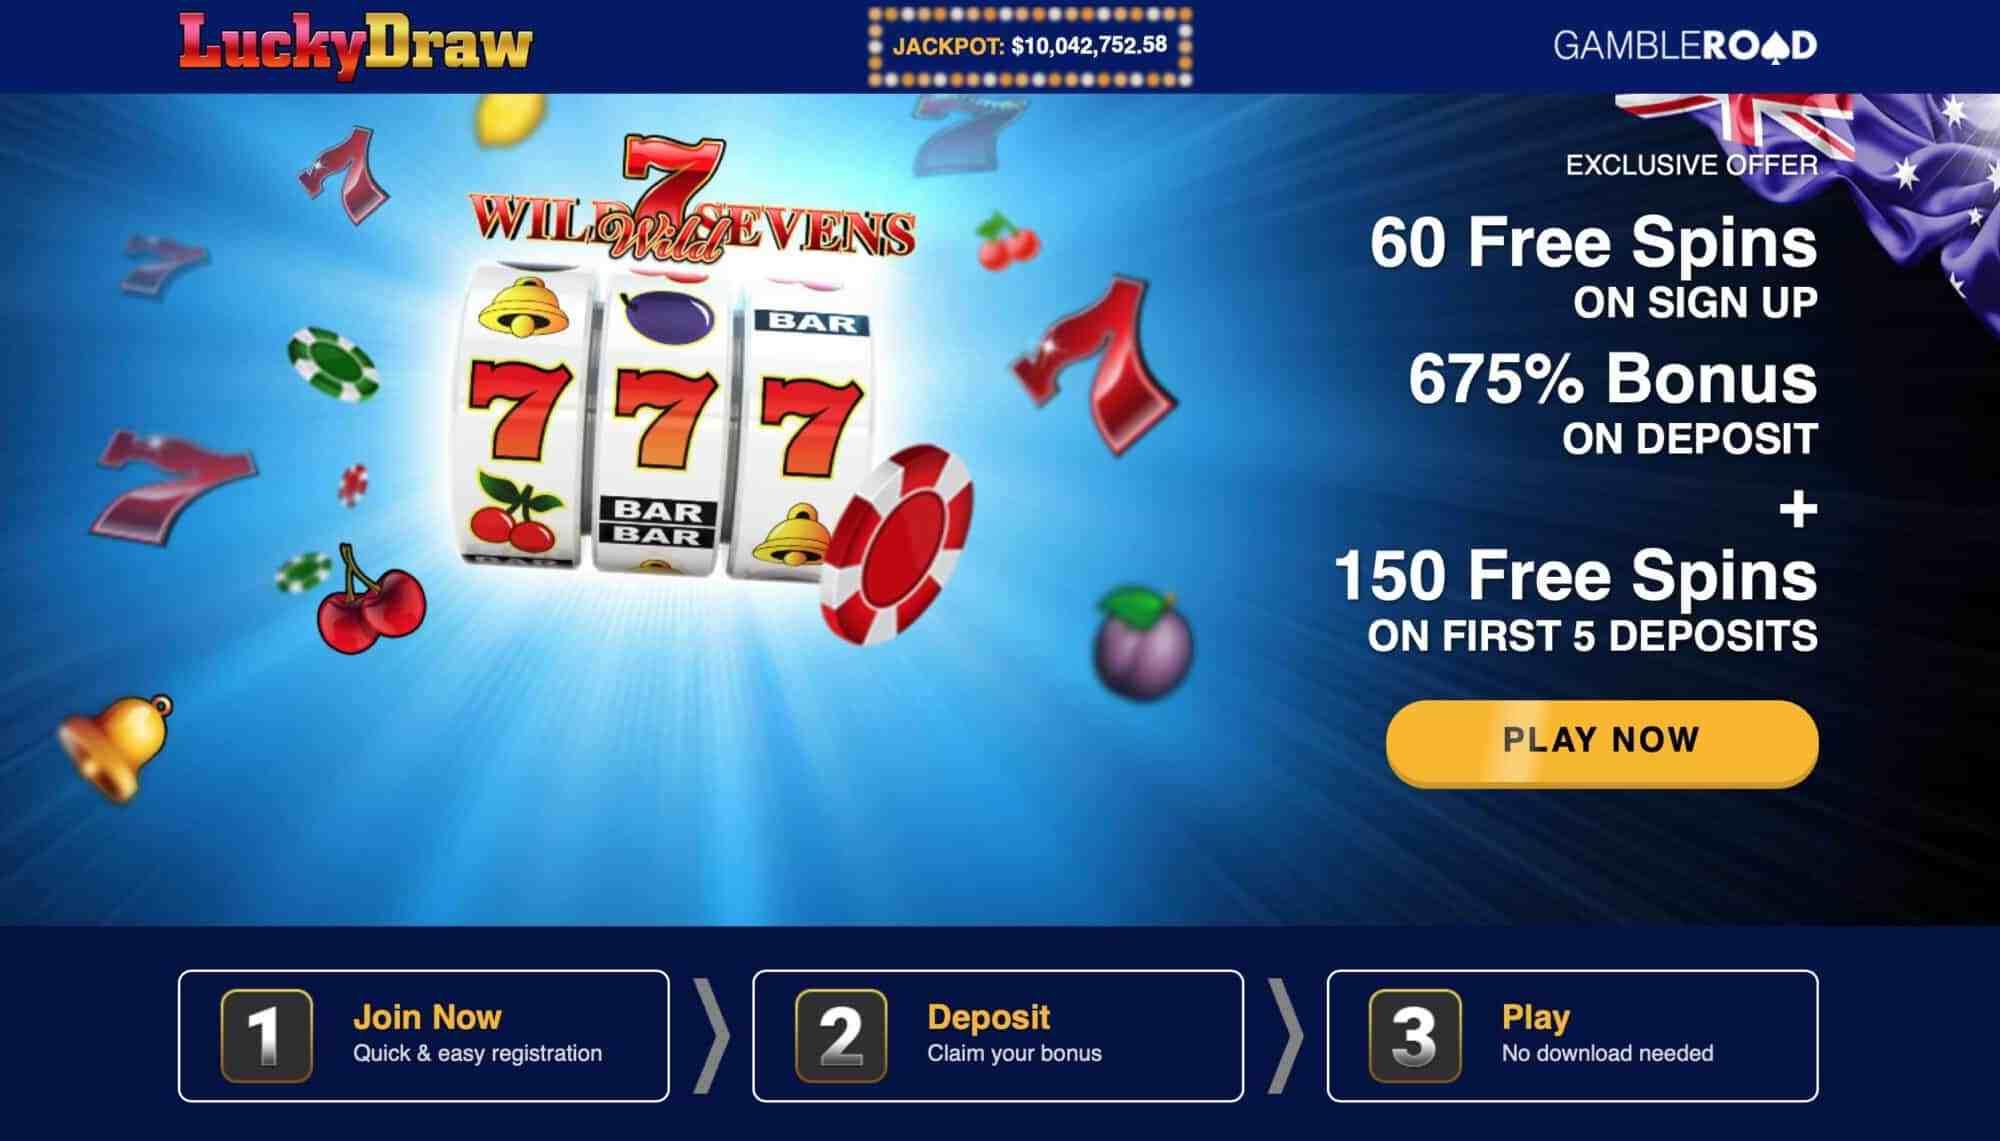 Luckydraw Casino - Get 150 Free Spins On Signup + 675% Deposit Bonus